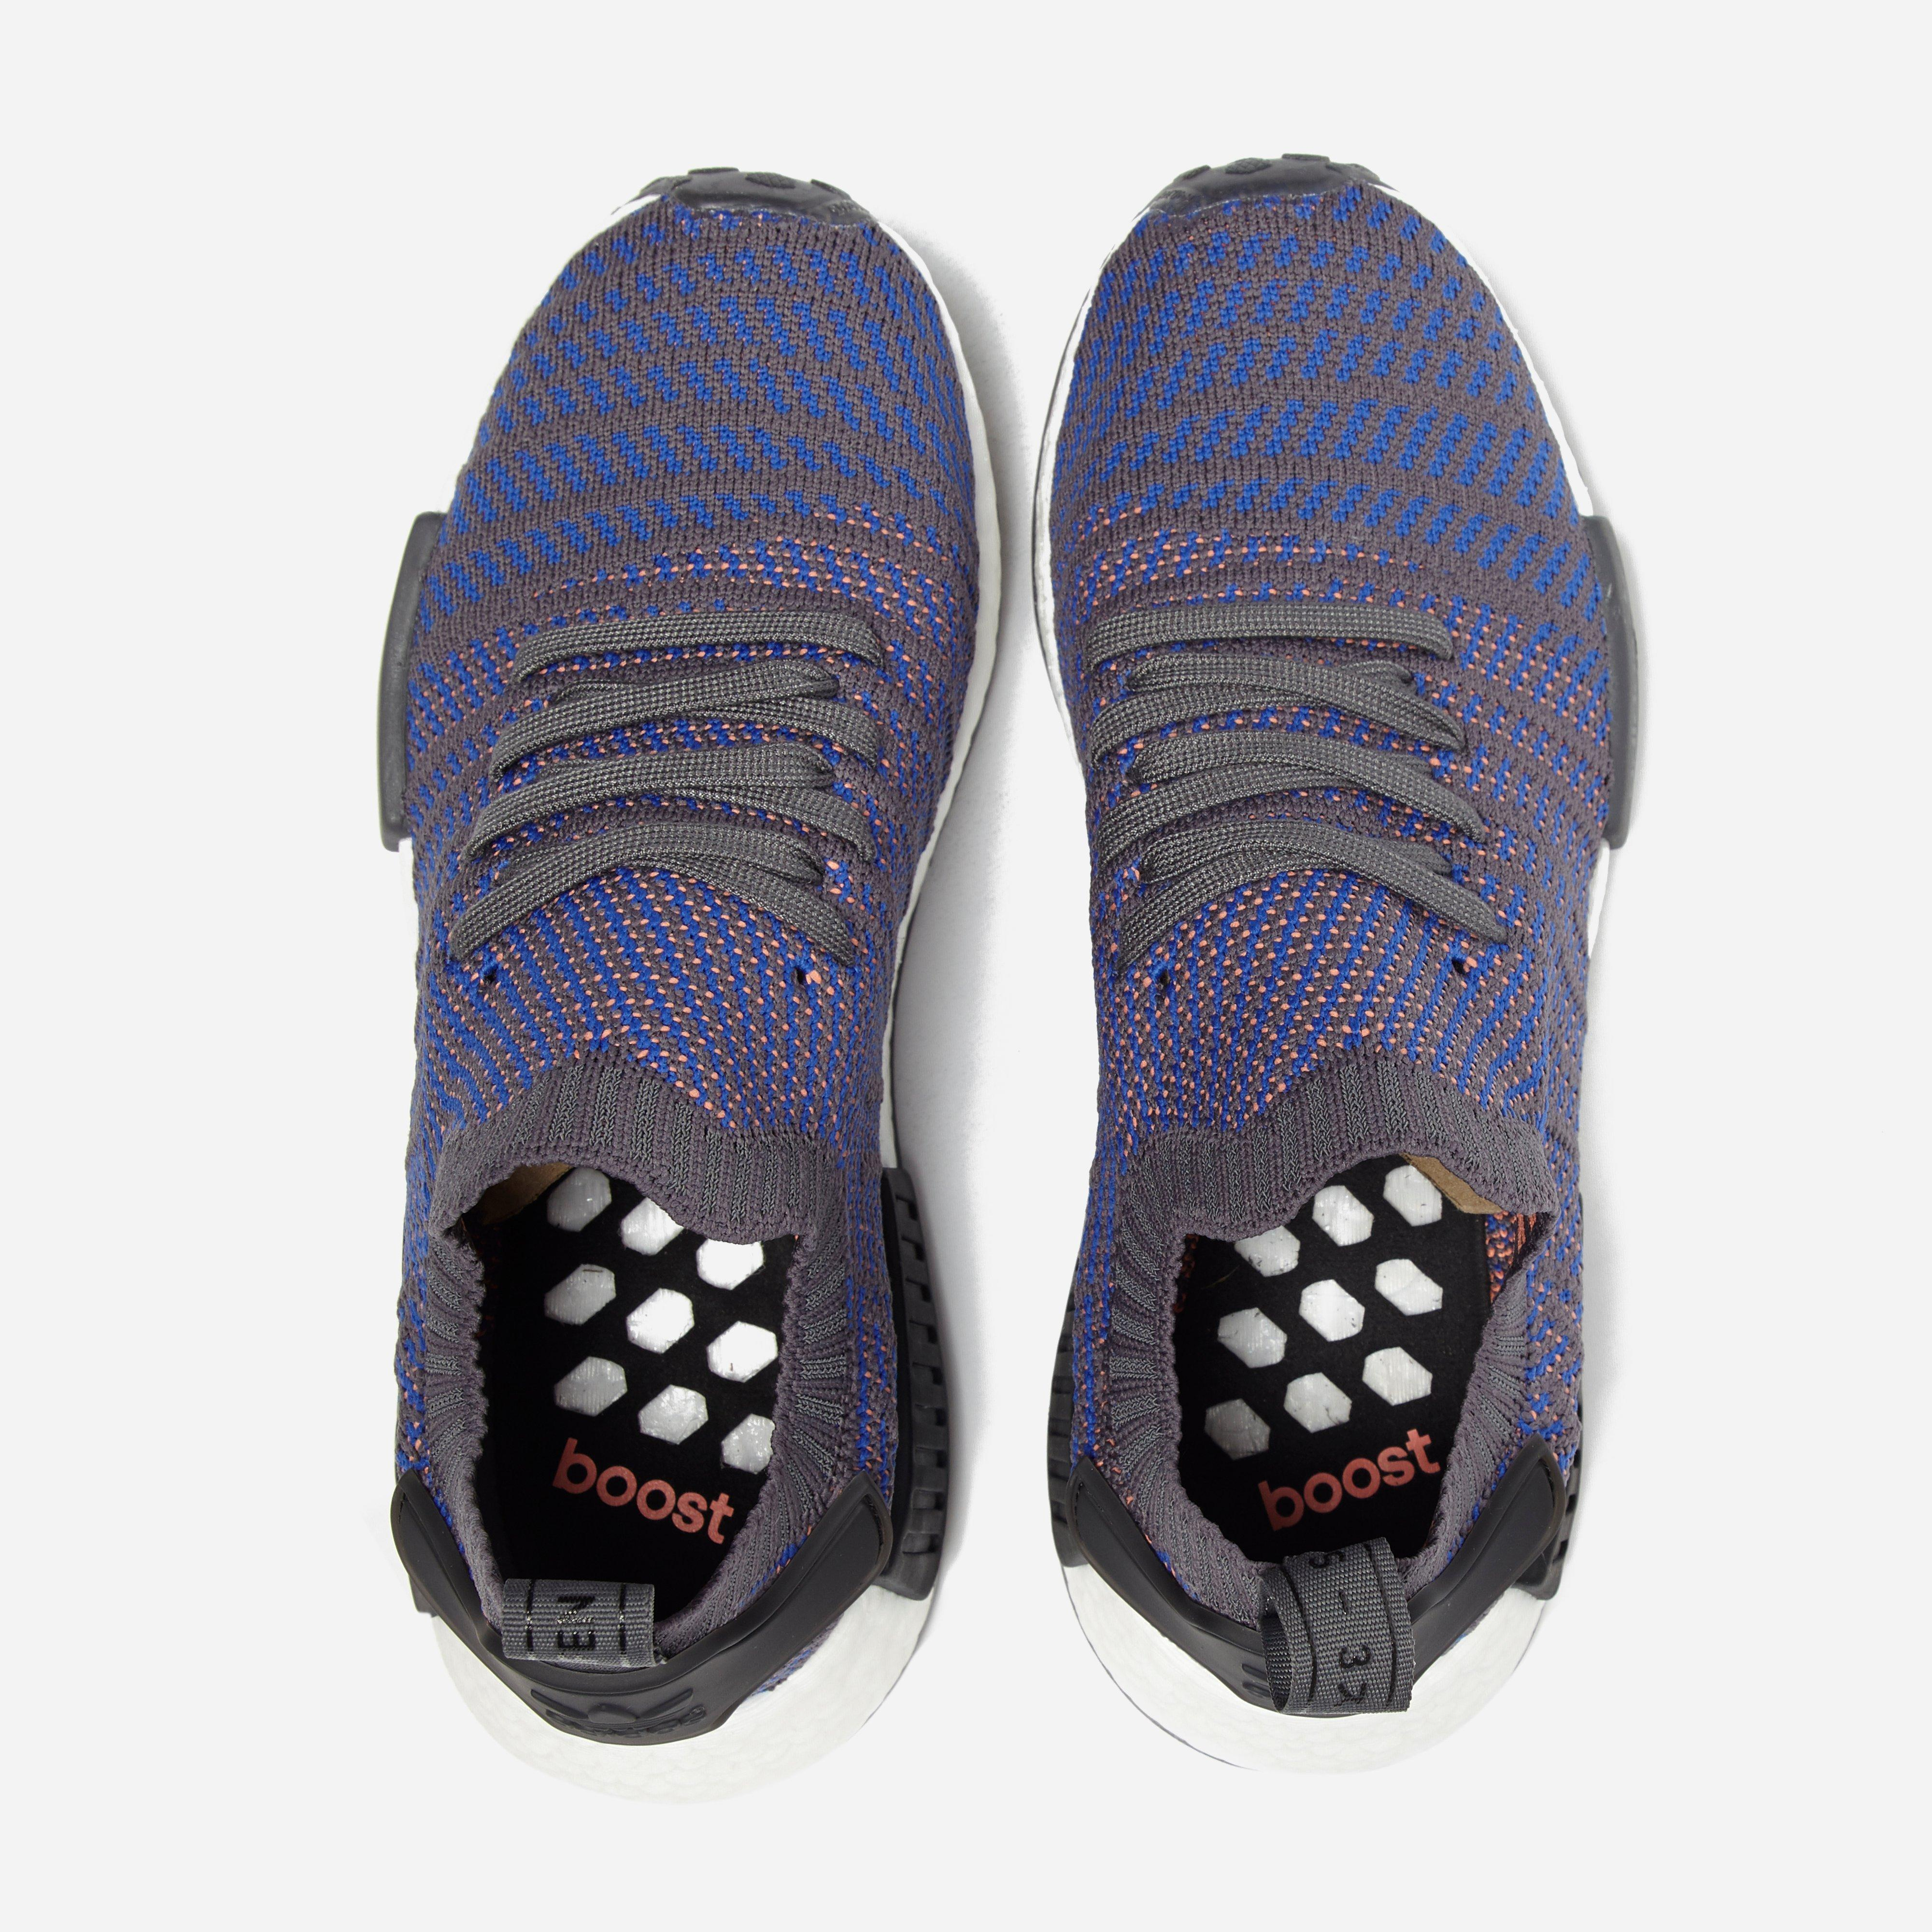 95da80b2b 8089a c2628  wholesale lyst adidas originals nmd r1 stlt pk in blue for men  faab7 da52a